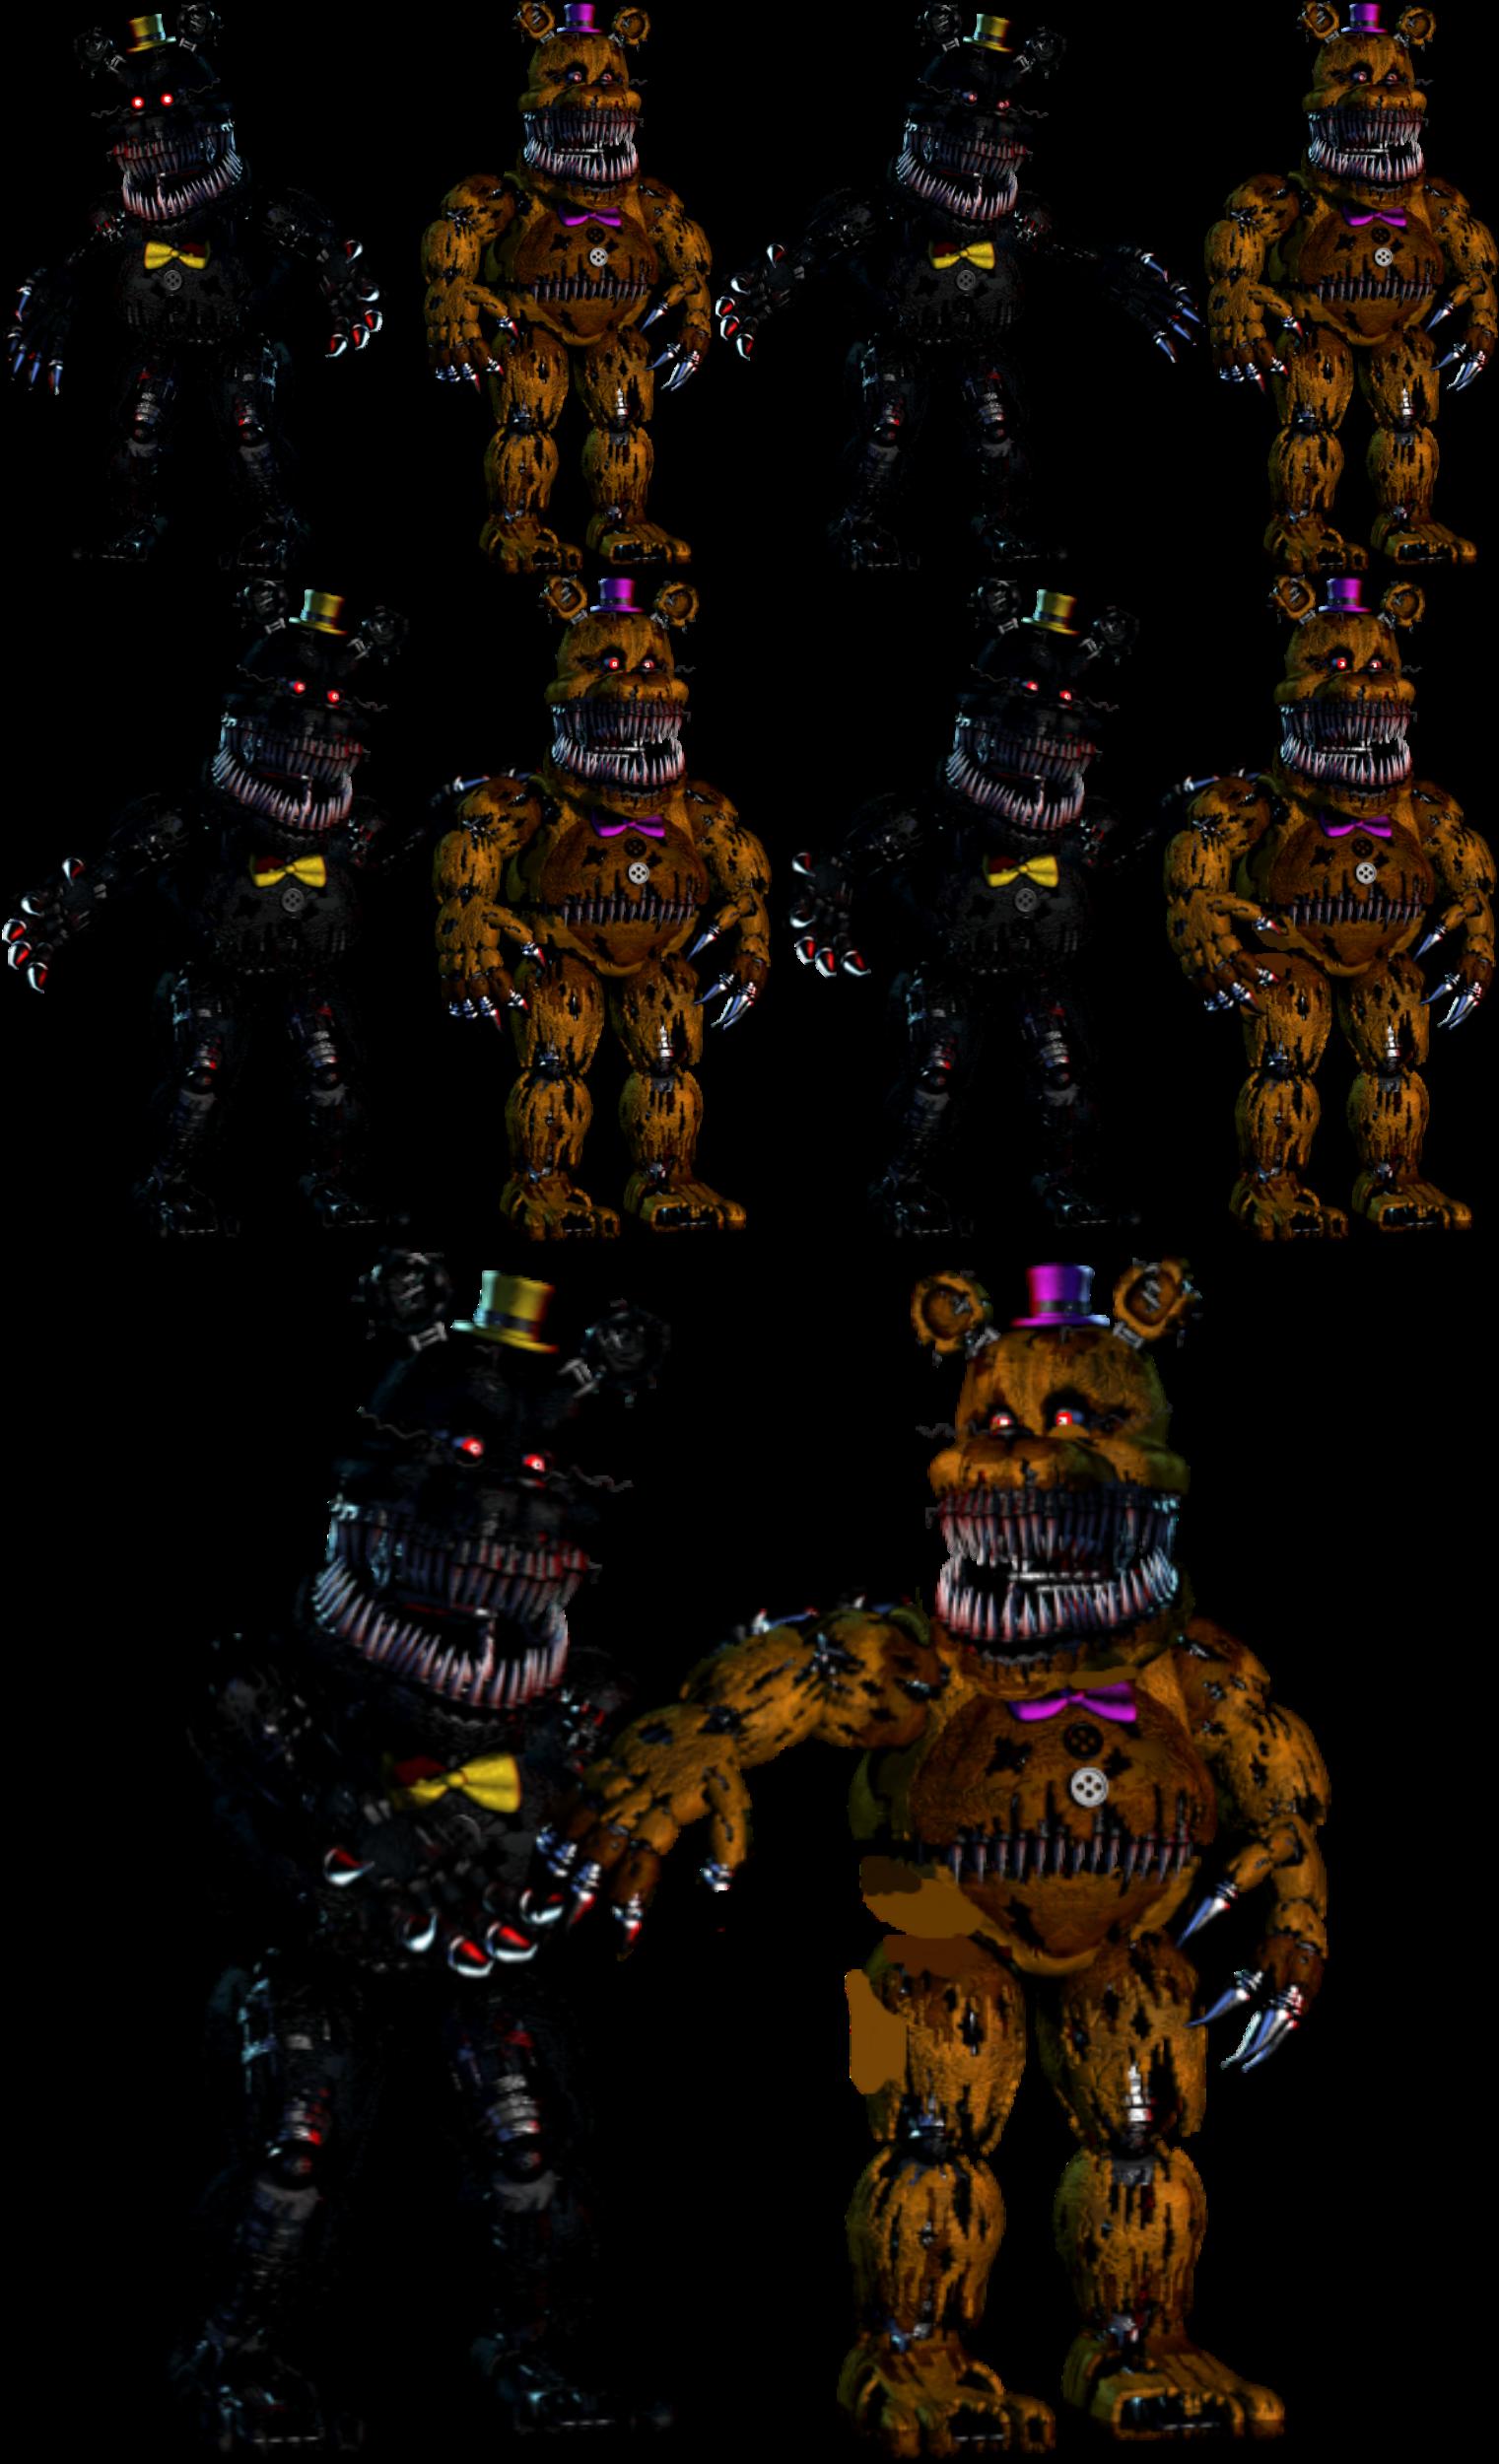 Nightmare fredbear x nightmare by kittenlover75 on deviantart